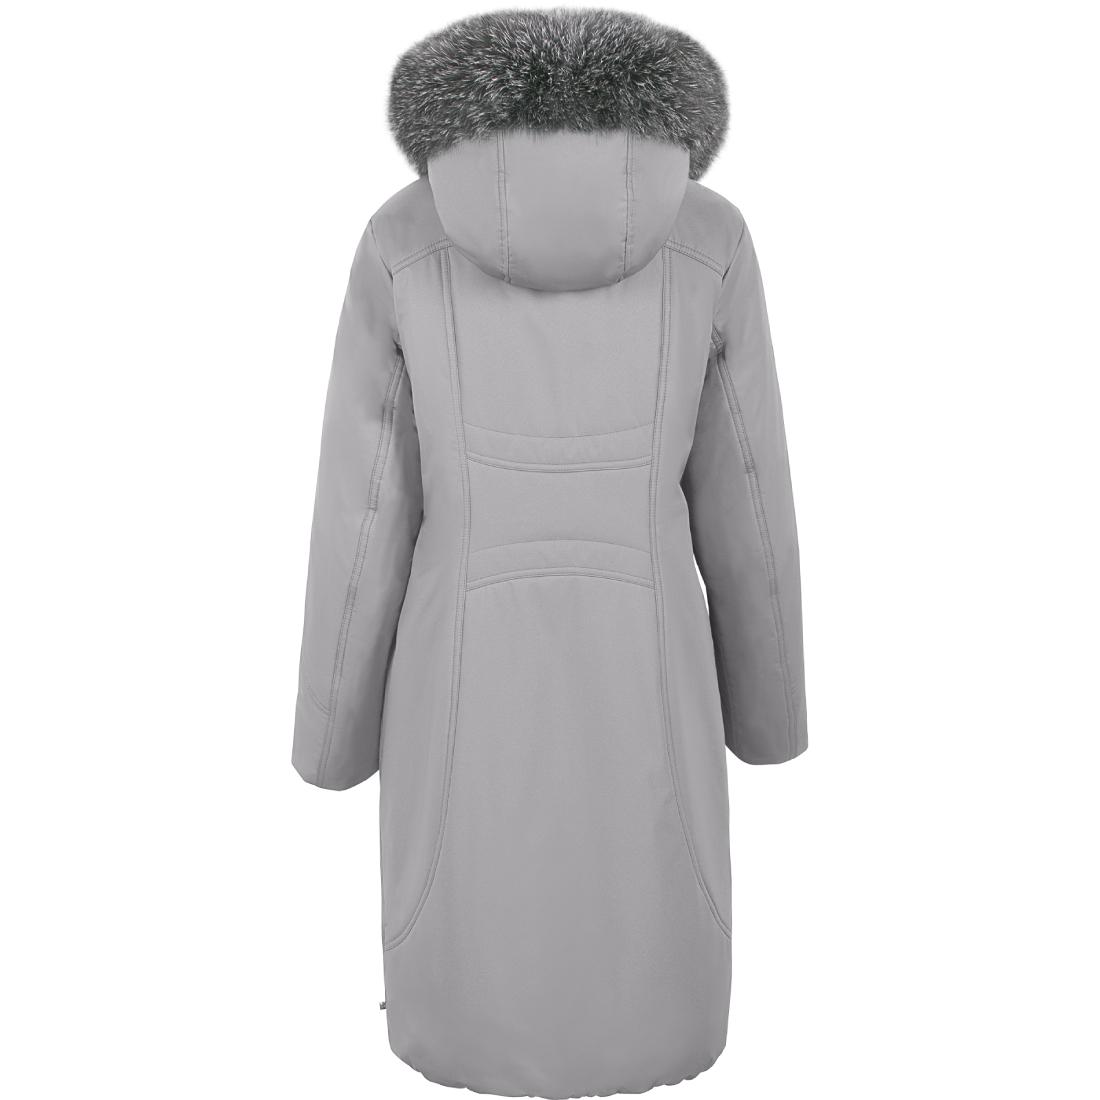 Куртка женская зима 3158F/100 светло-серый LimoLady — фото 2